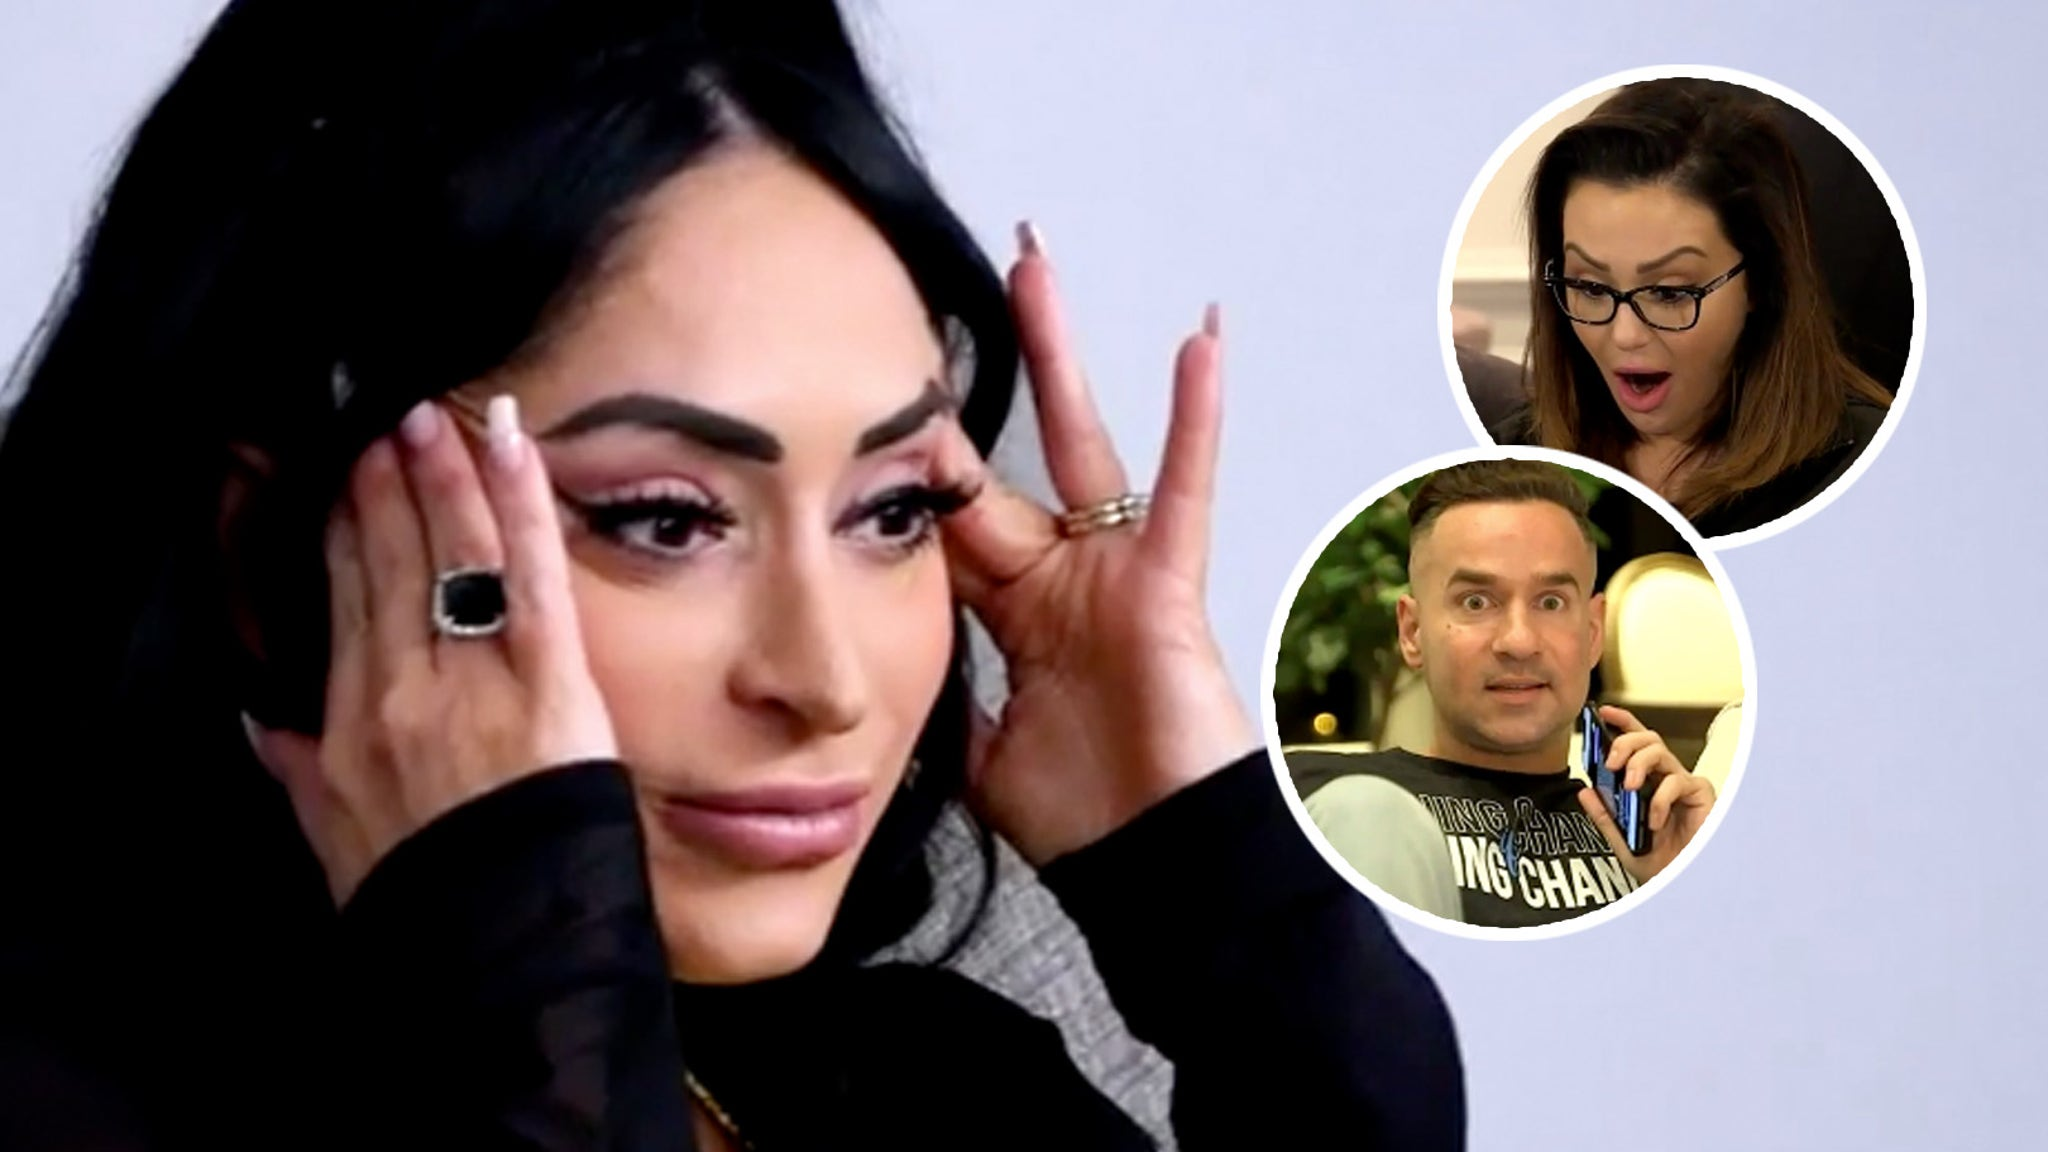 Has Angelina Pivarnick been cheating on her husband?